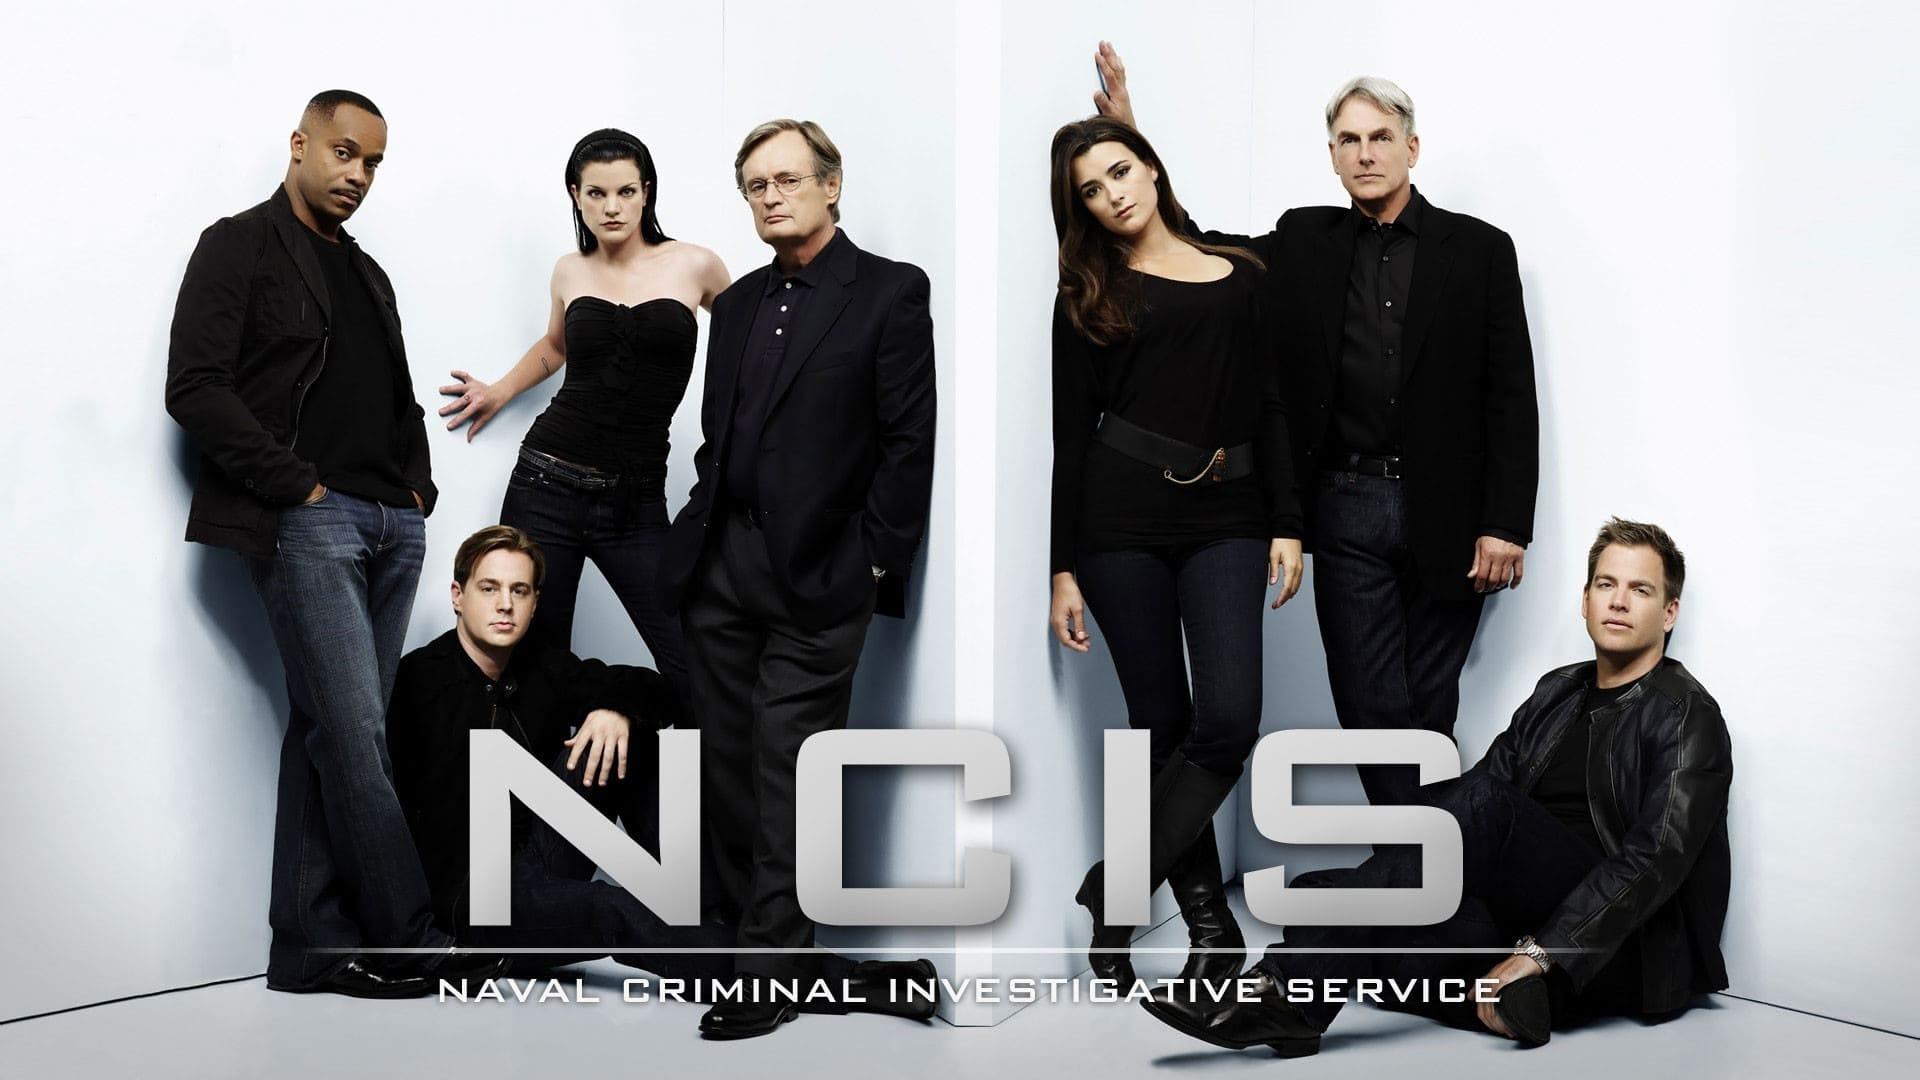 NCIS Season 4 Episode 11 : Driven